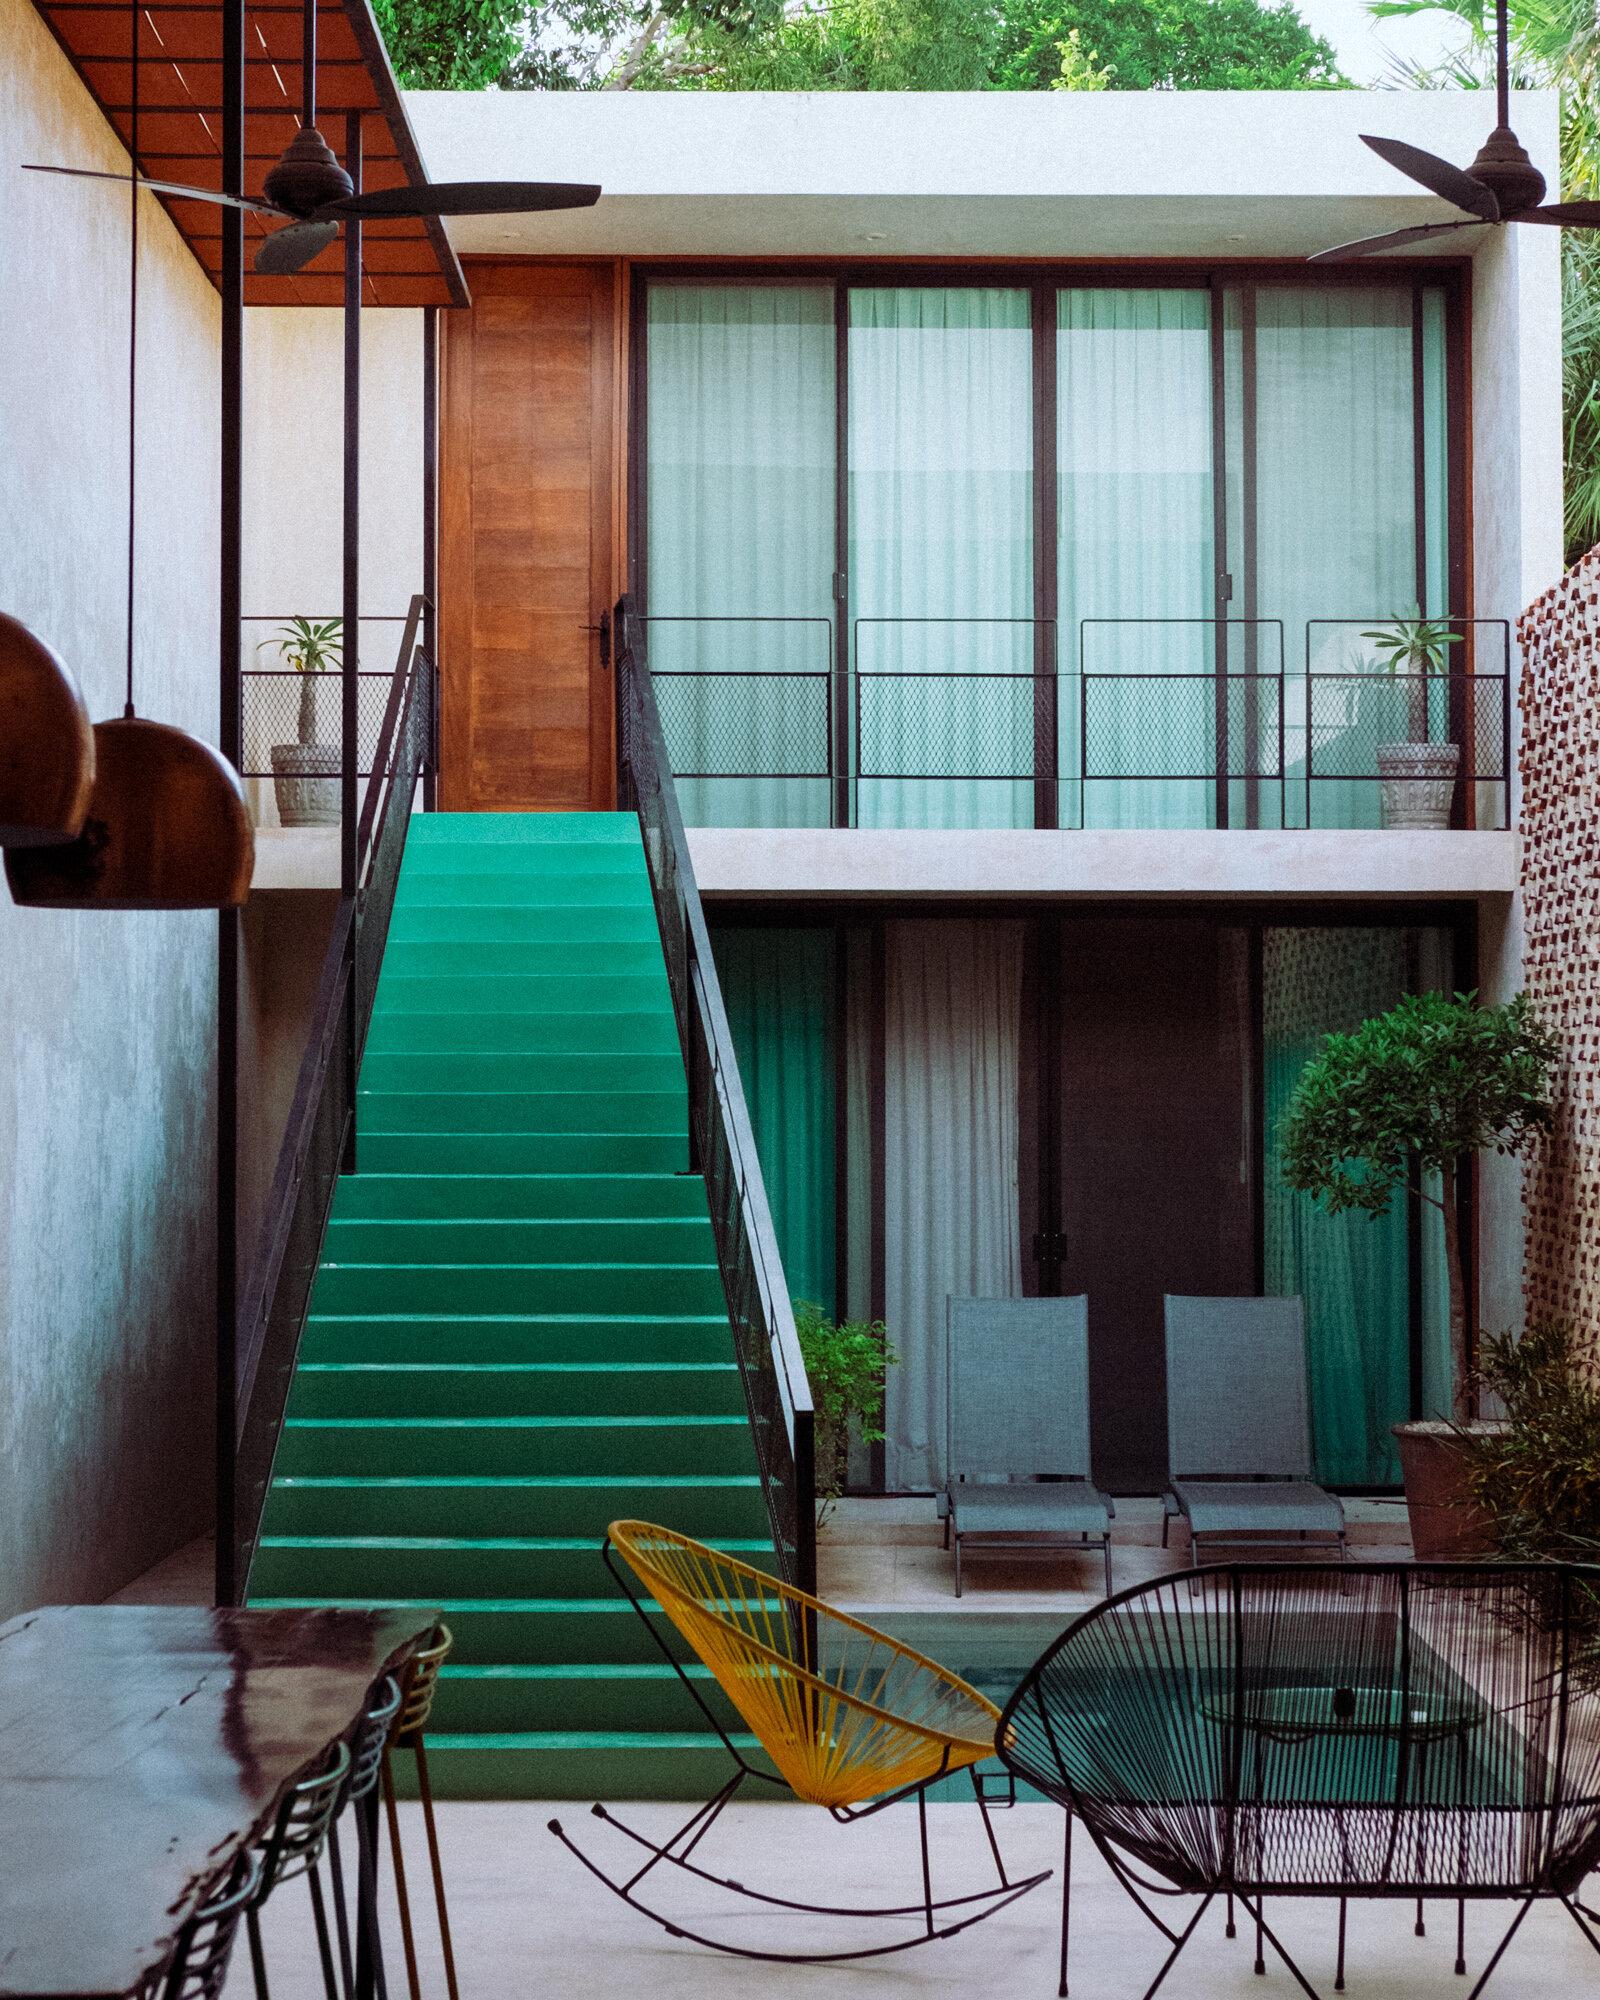 Rachel Off Duty: Airbnbs in Merida, Mexico